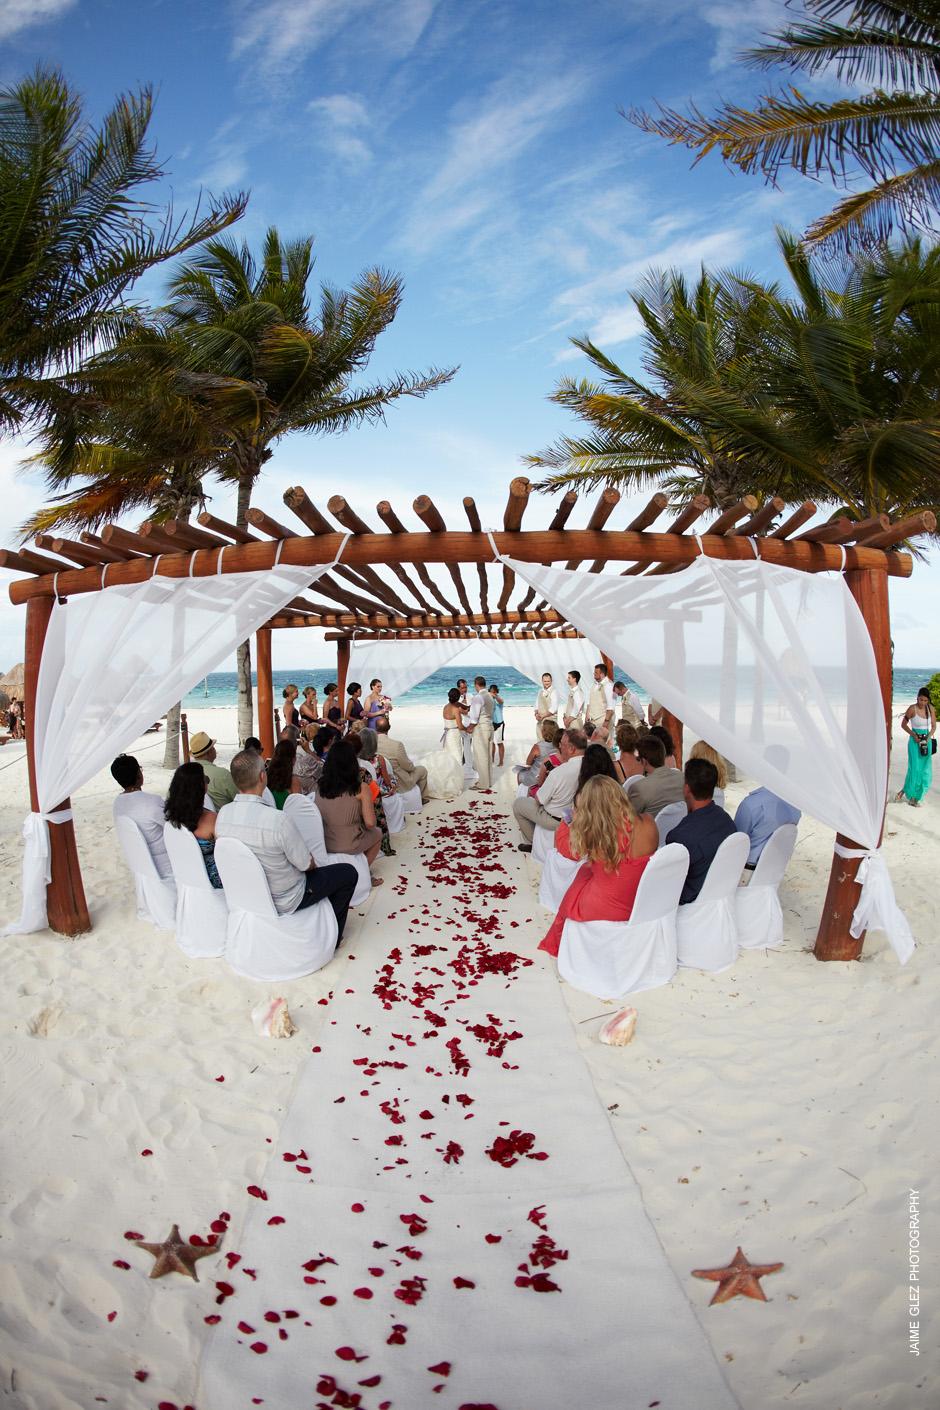 Cancun riviera maya wedding photographer jaime glez for Riviera maya wedding photographer